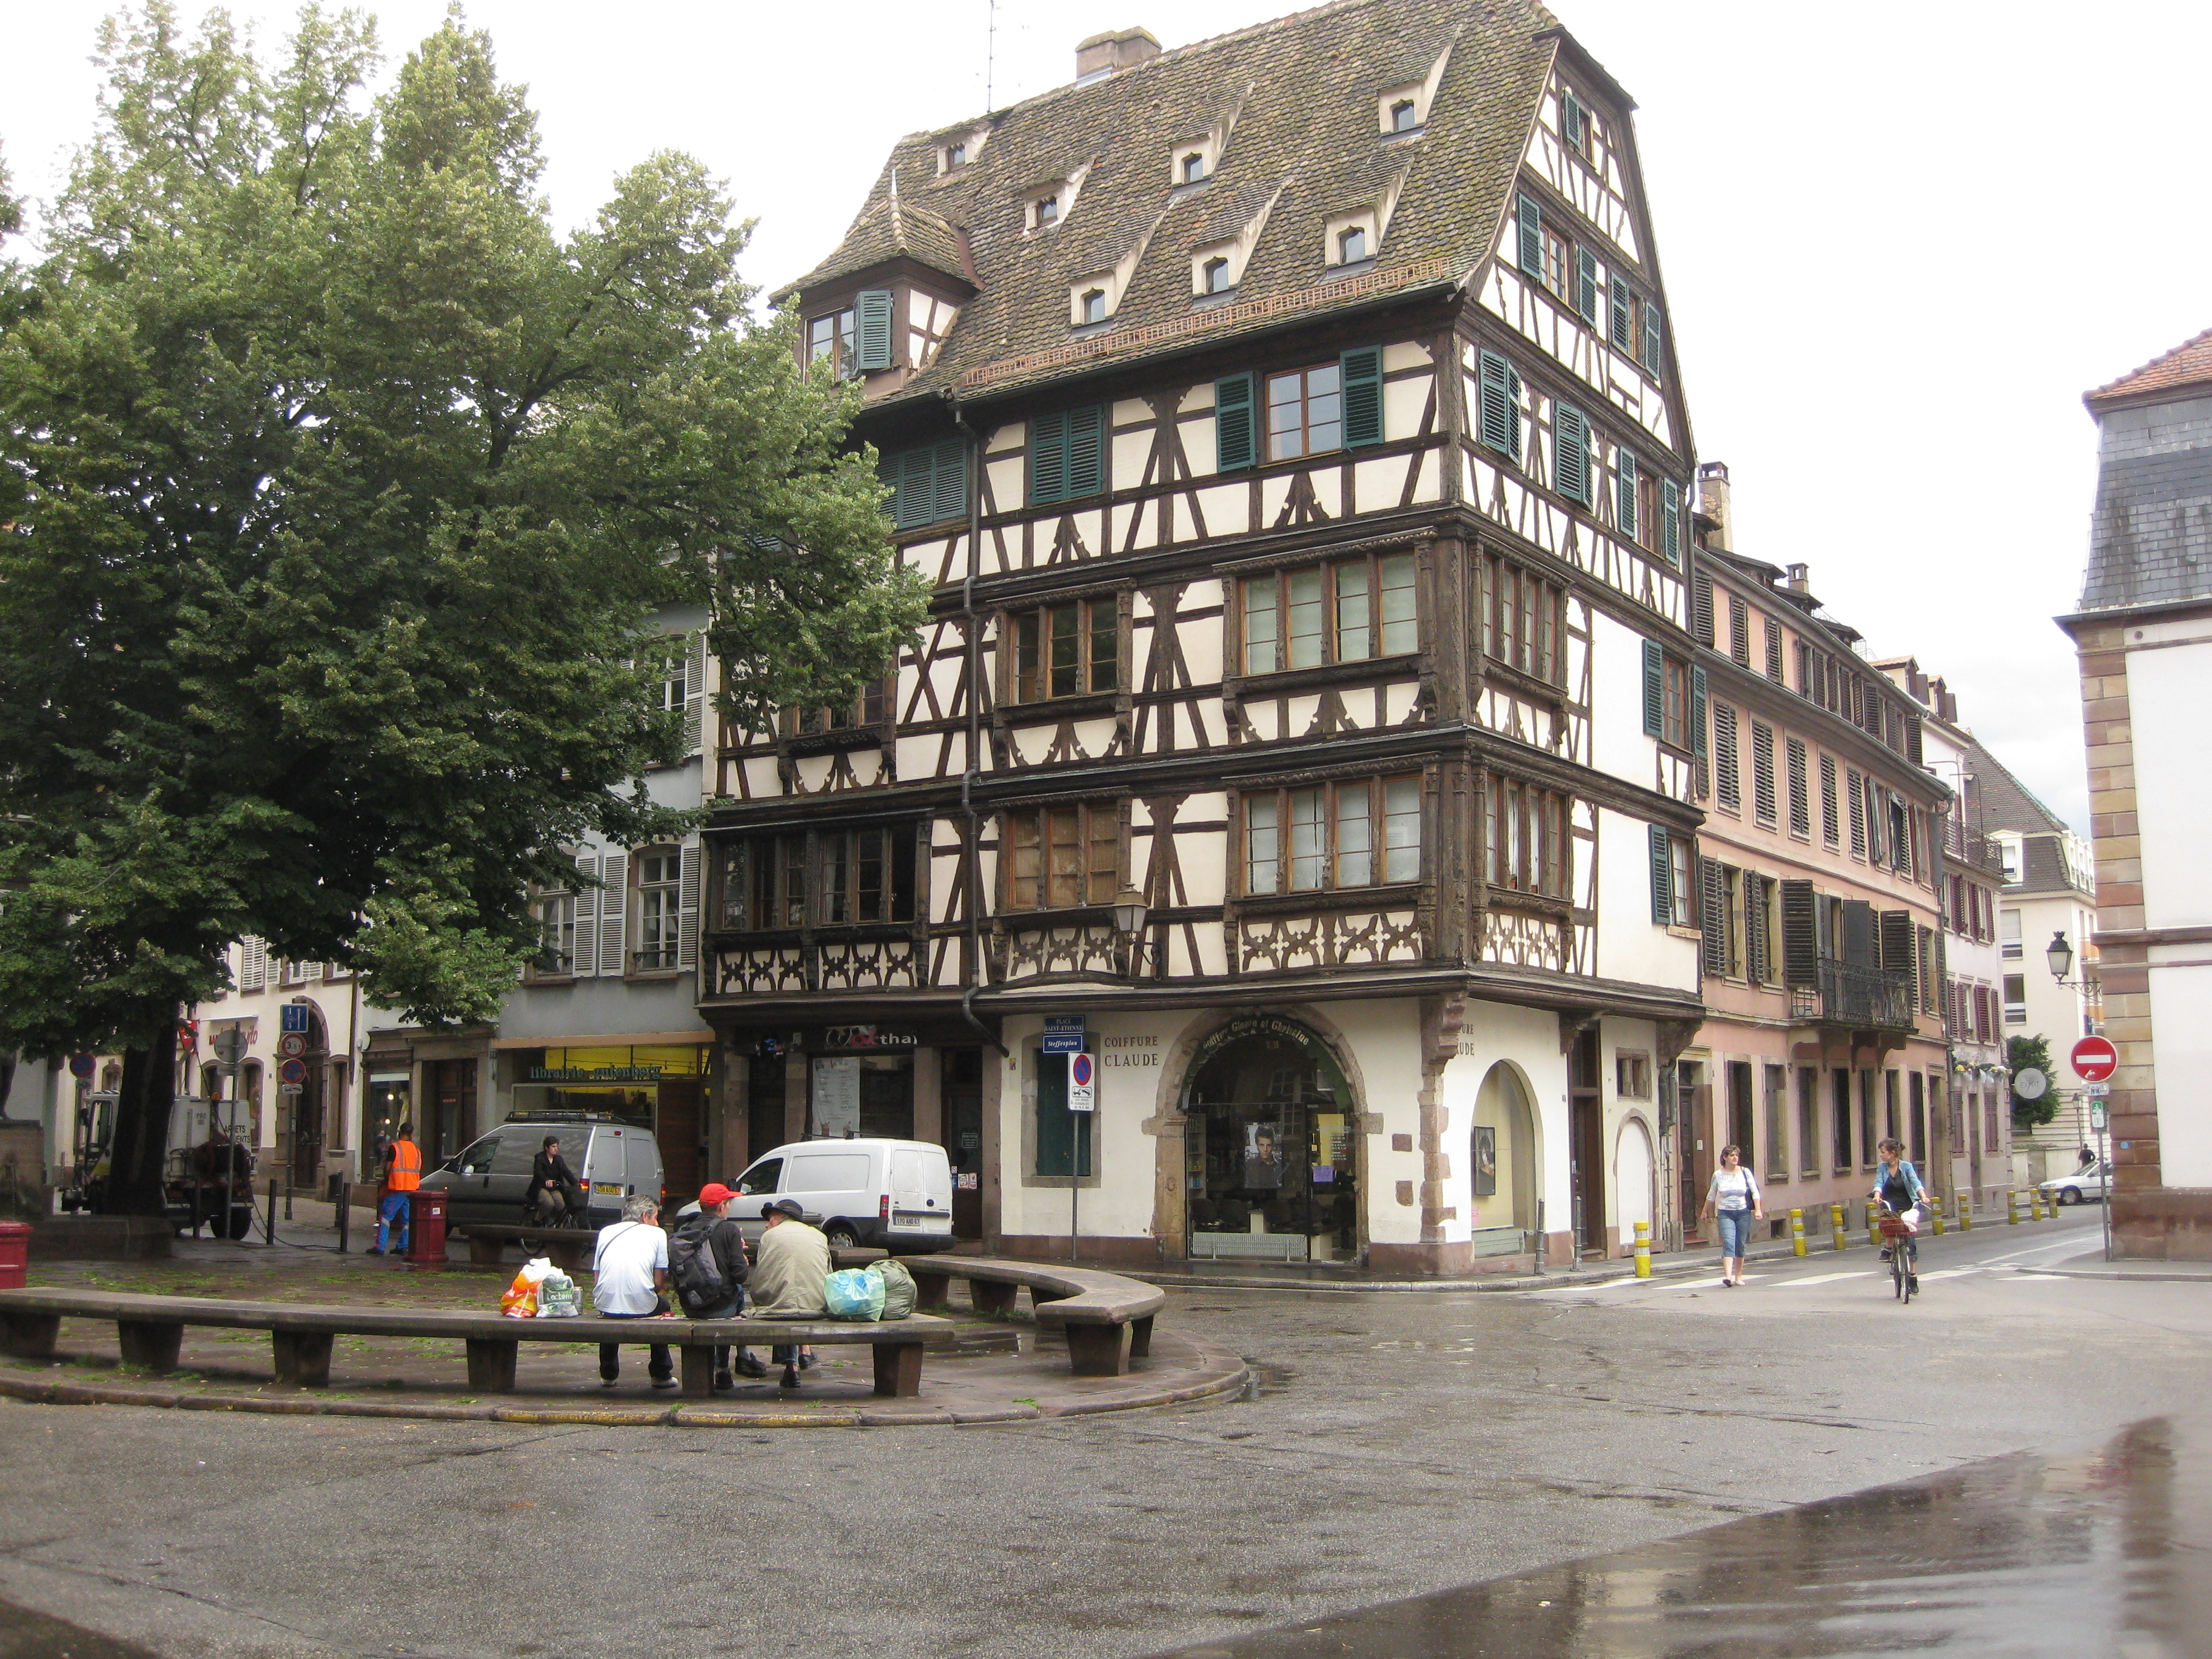 File:Maison, 11 place Saint-Étienne, Strasbourg.jpg - Wikimedia Commons